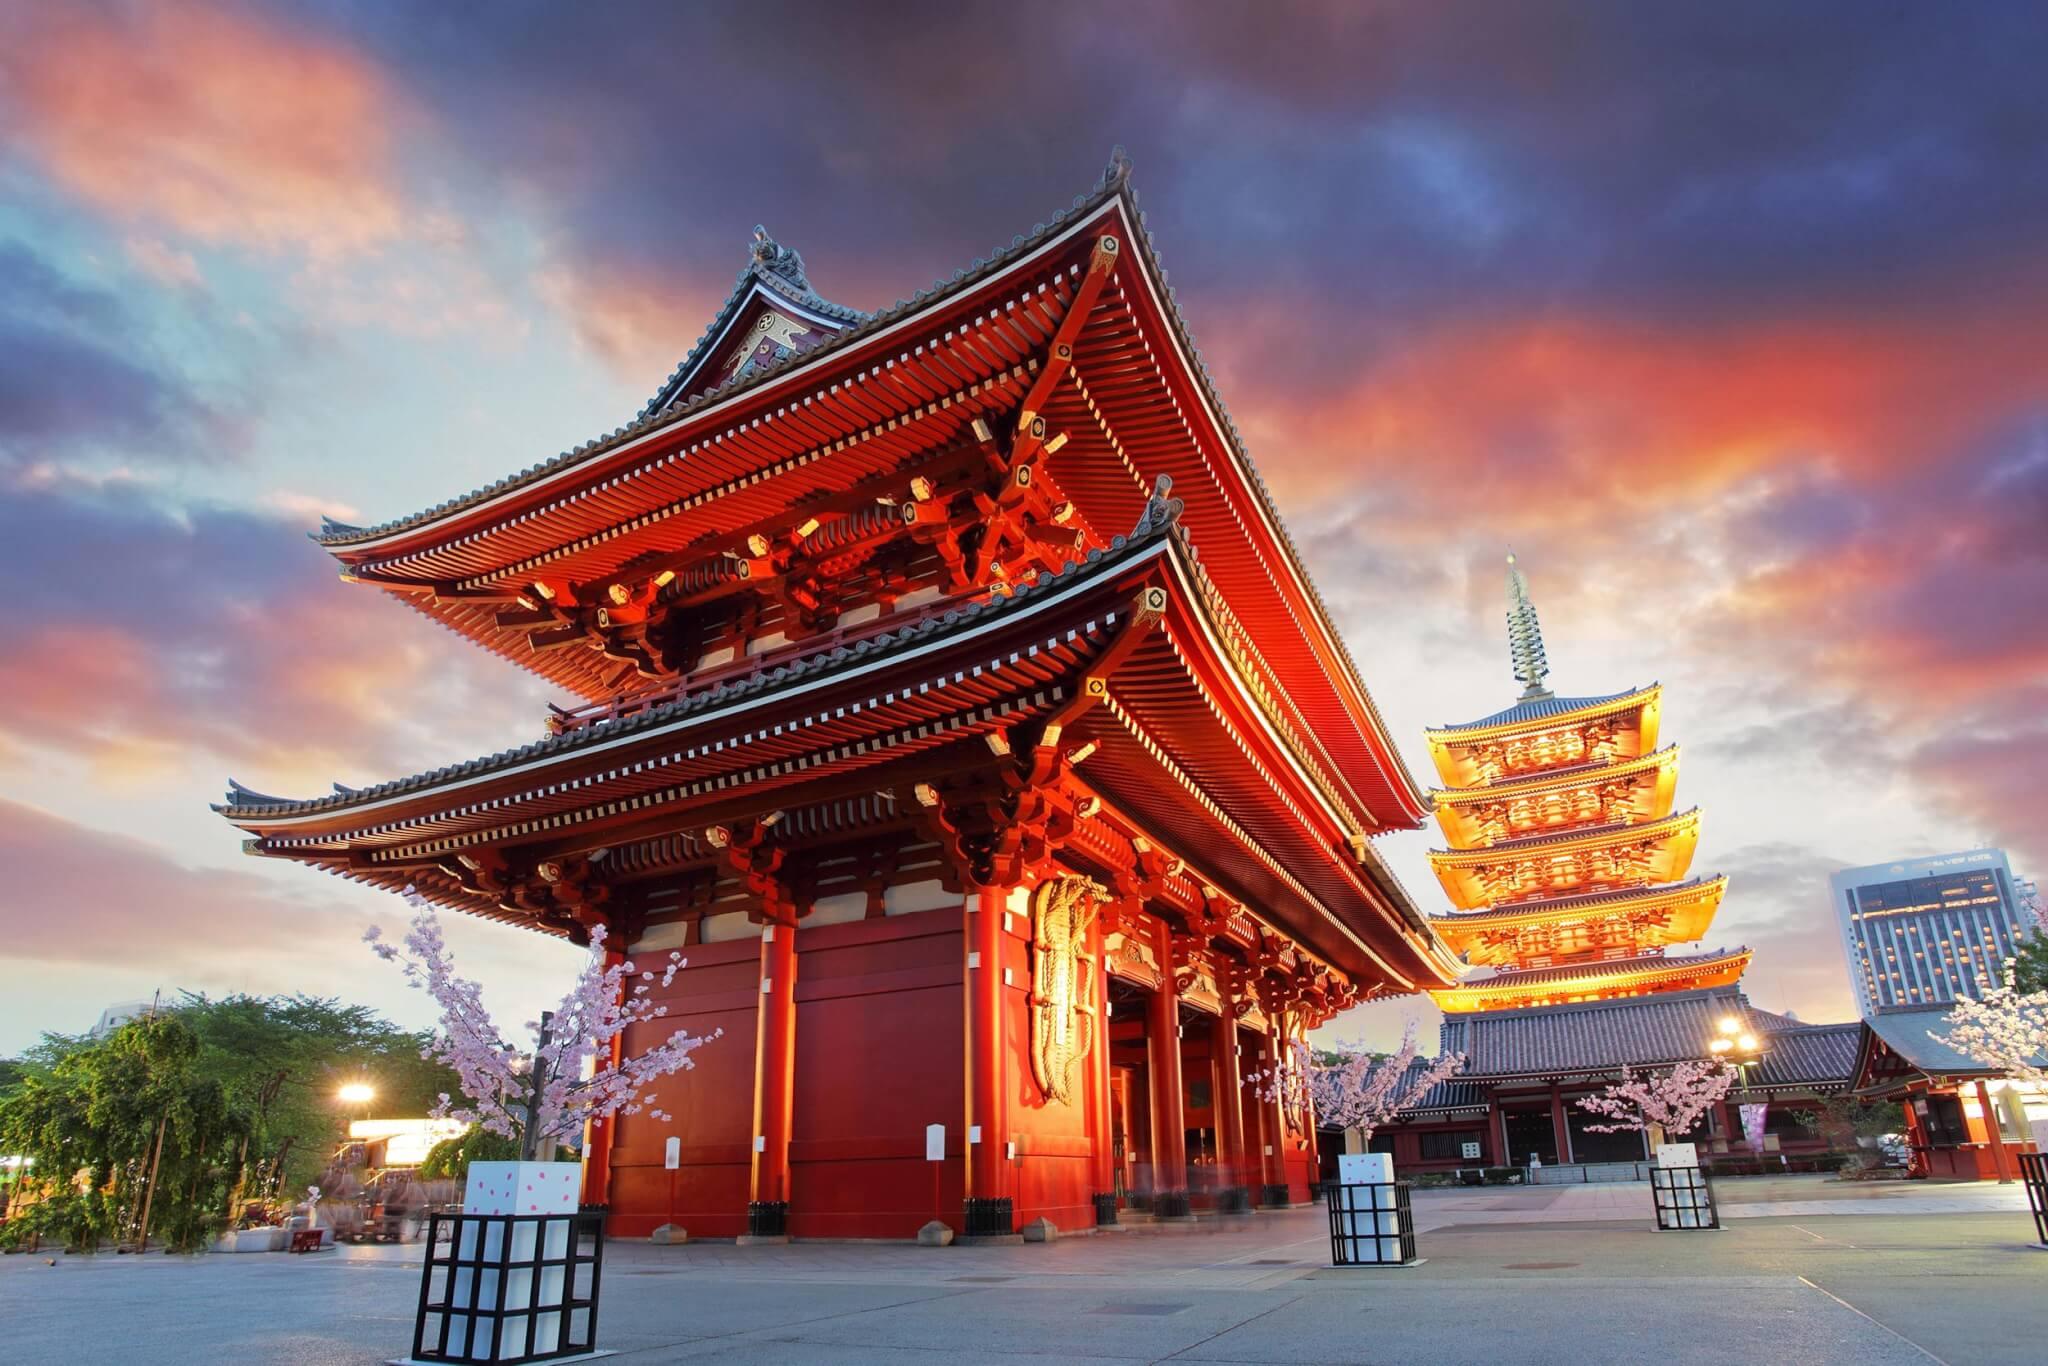 https://travelicious.bold-themes.com/main-demo/wp-content/uploads/sites/2/2018/09/destination-tokyo-01.jpg